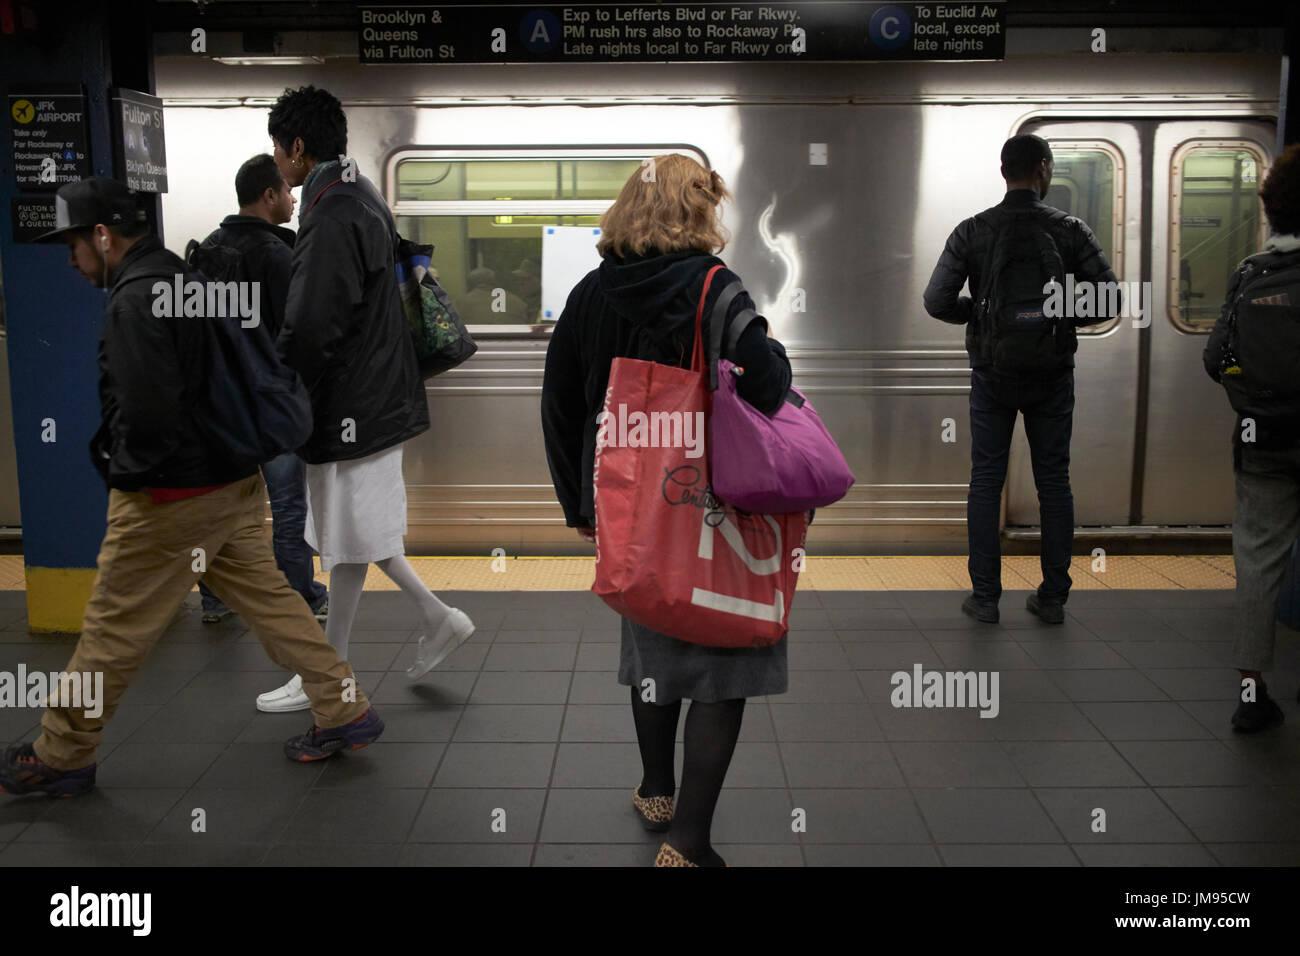 people waiting on arriving train new york subway New York City USA - Stock Image